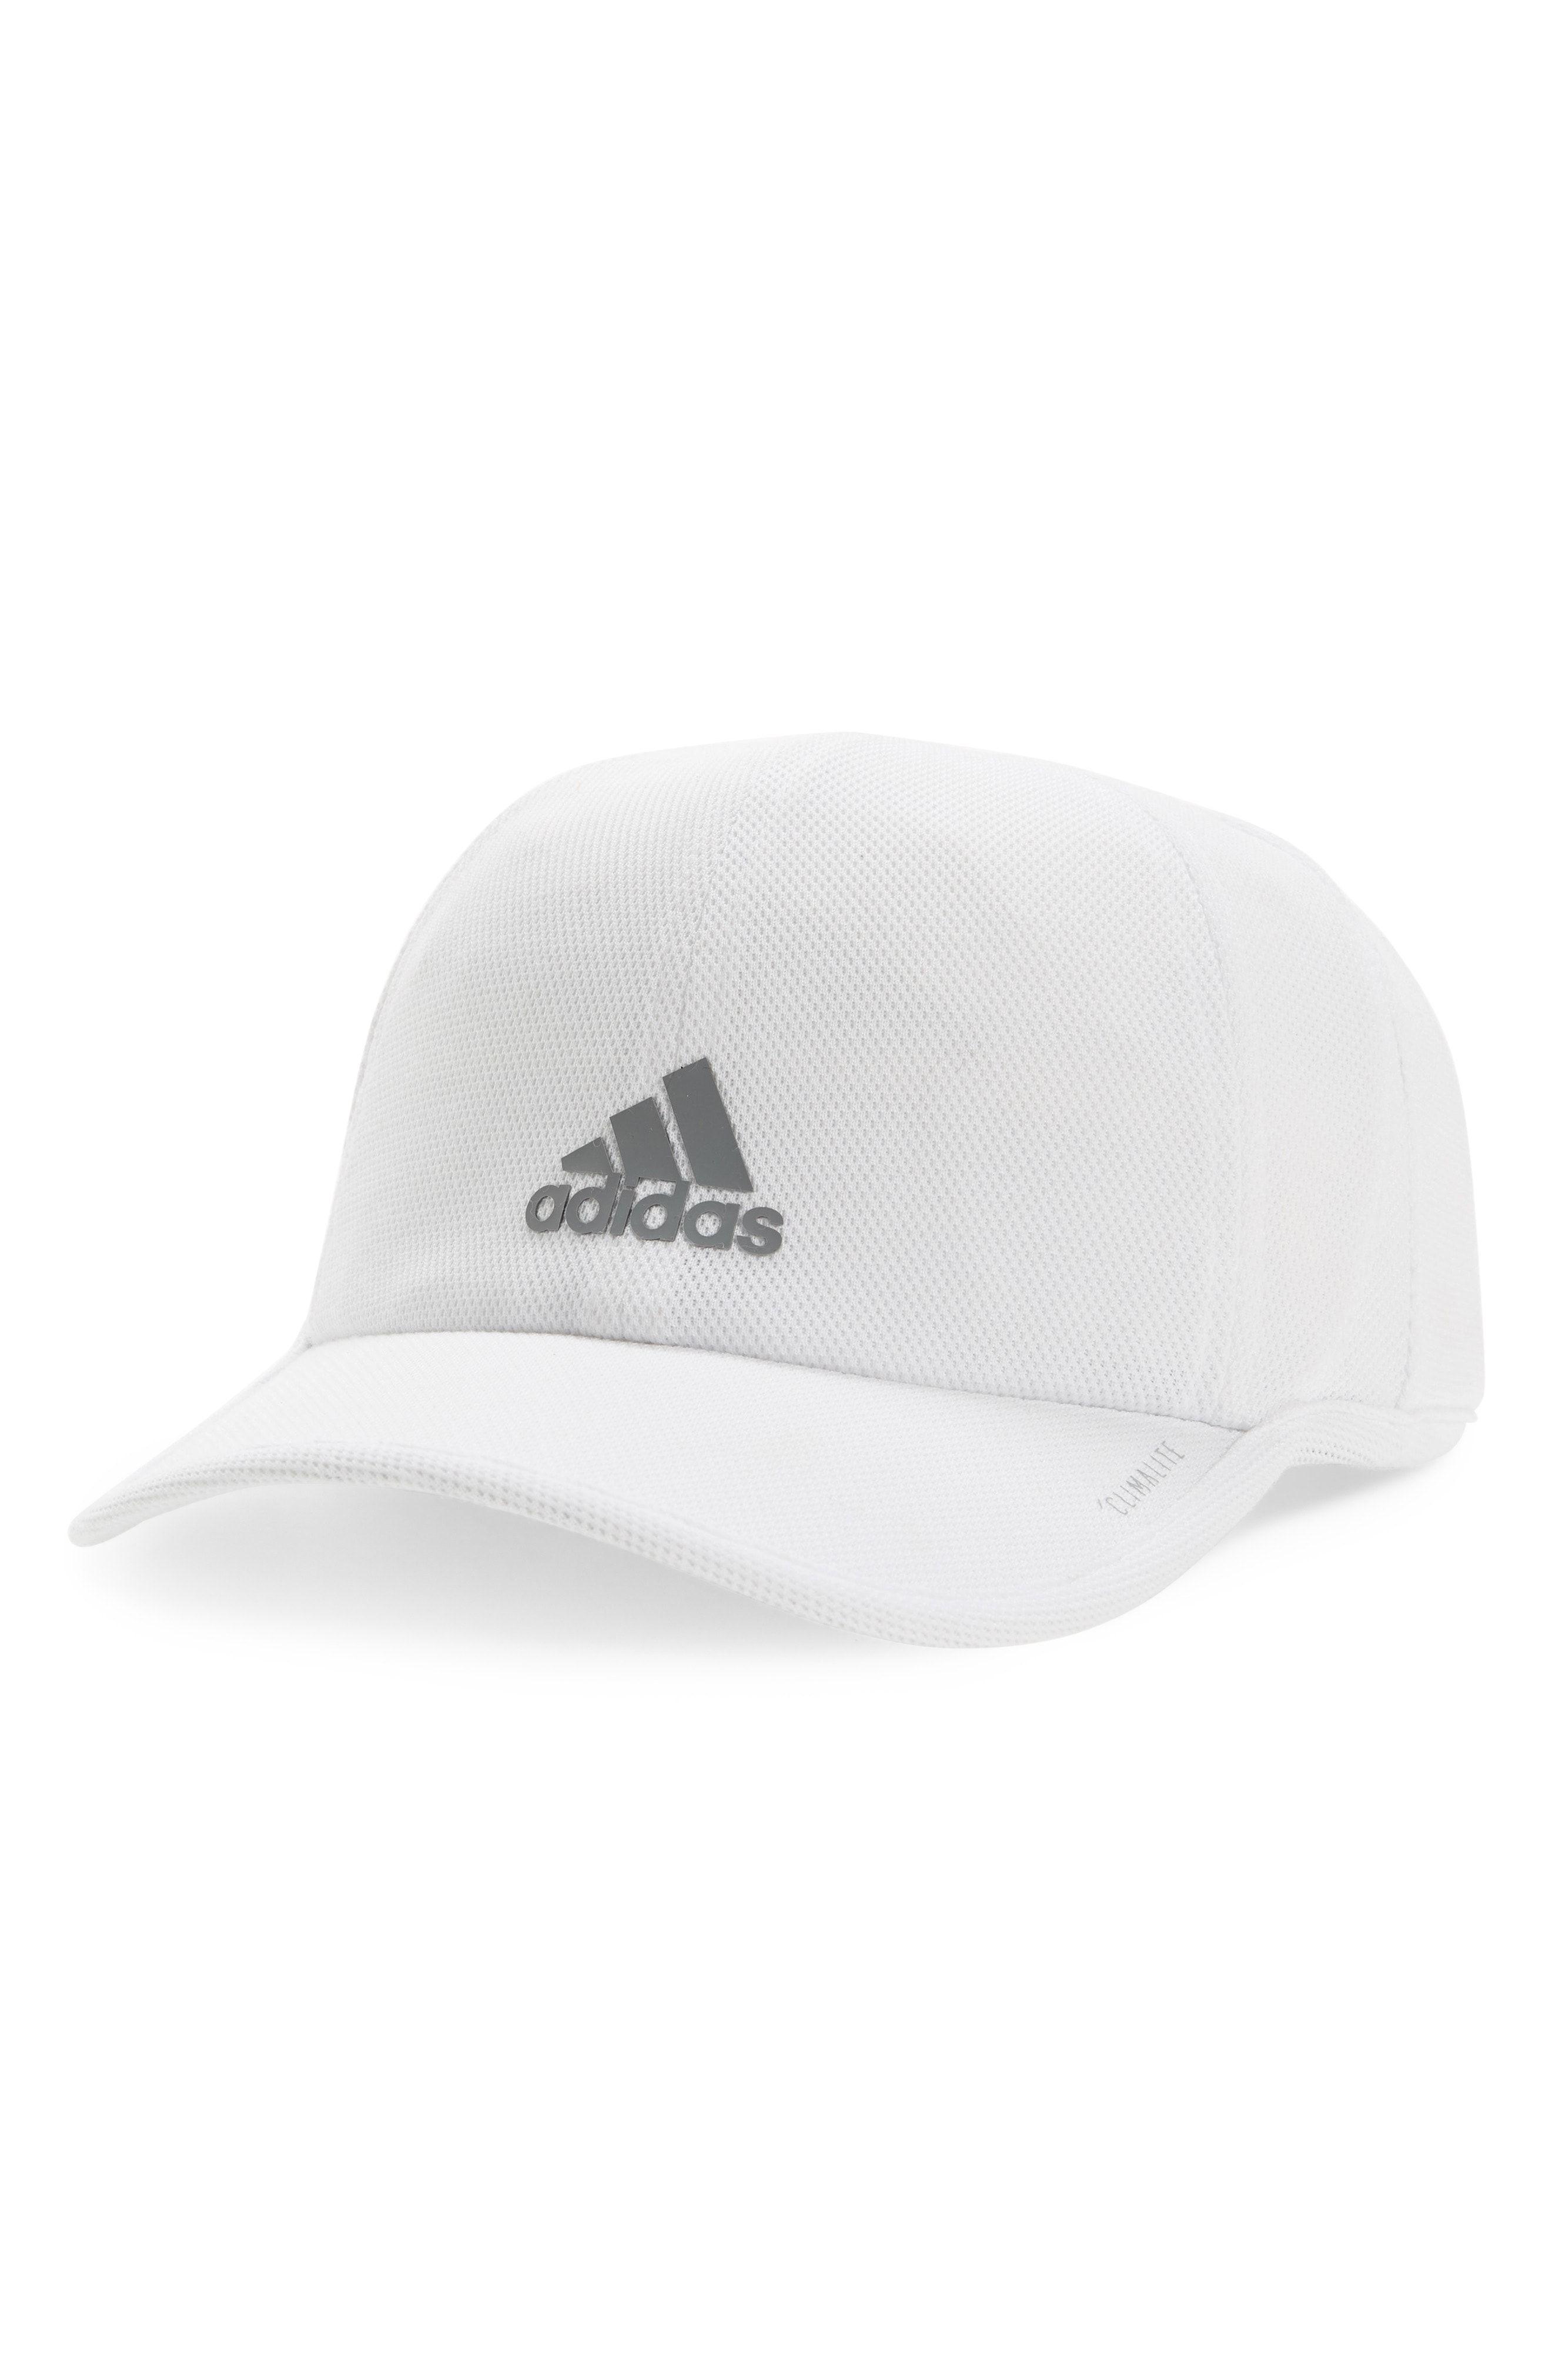 e108cf9f192 ADIDAS ORIGINALS ADIDAS ORIGINAL SUPERLITE PRO II BASEBALL CAP - WHITE.   adidasoriginals